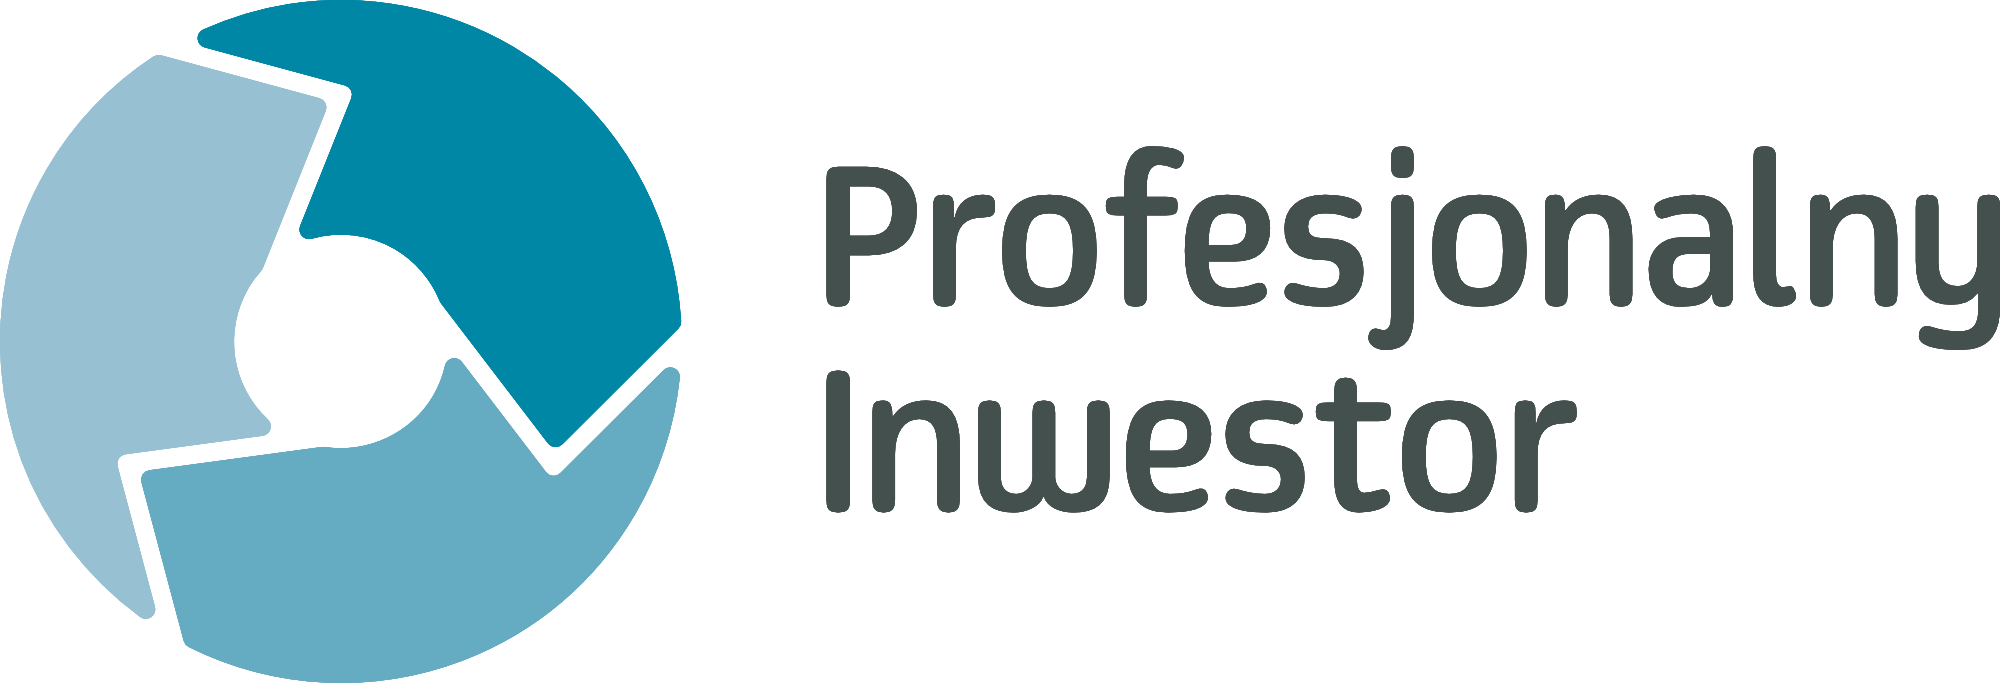 Profesjonalny Inwestor 2017